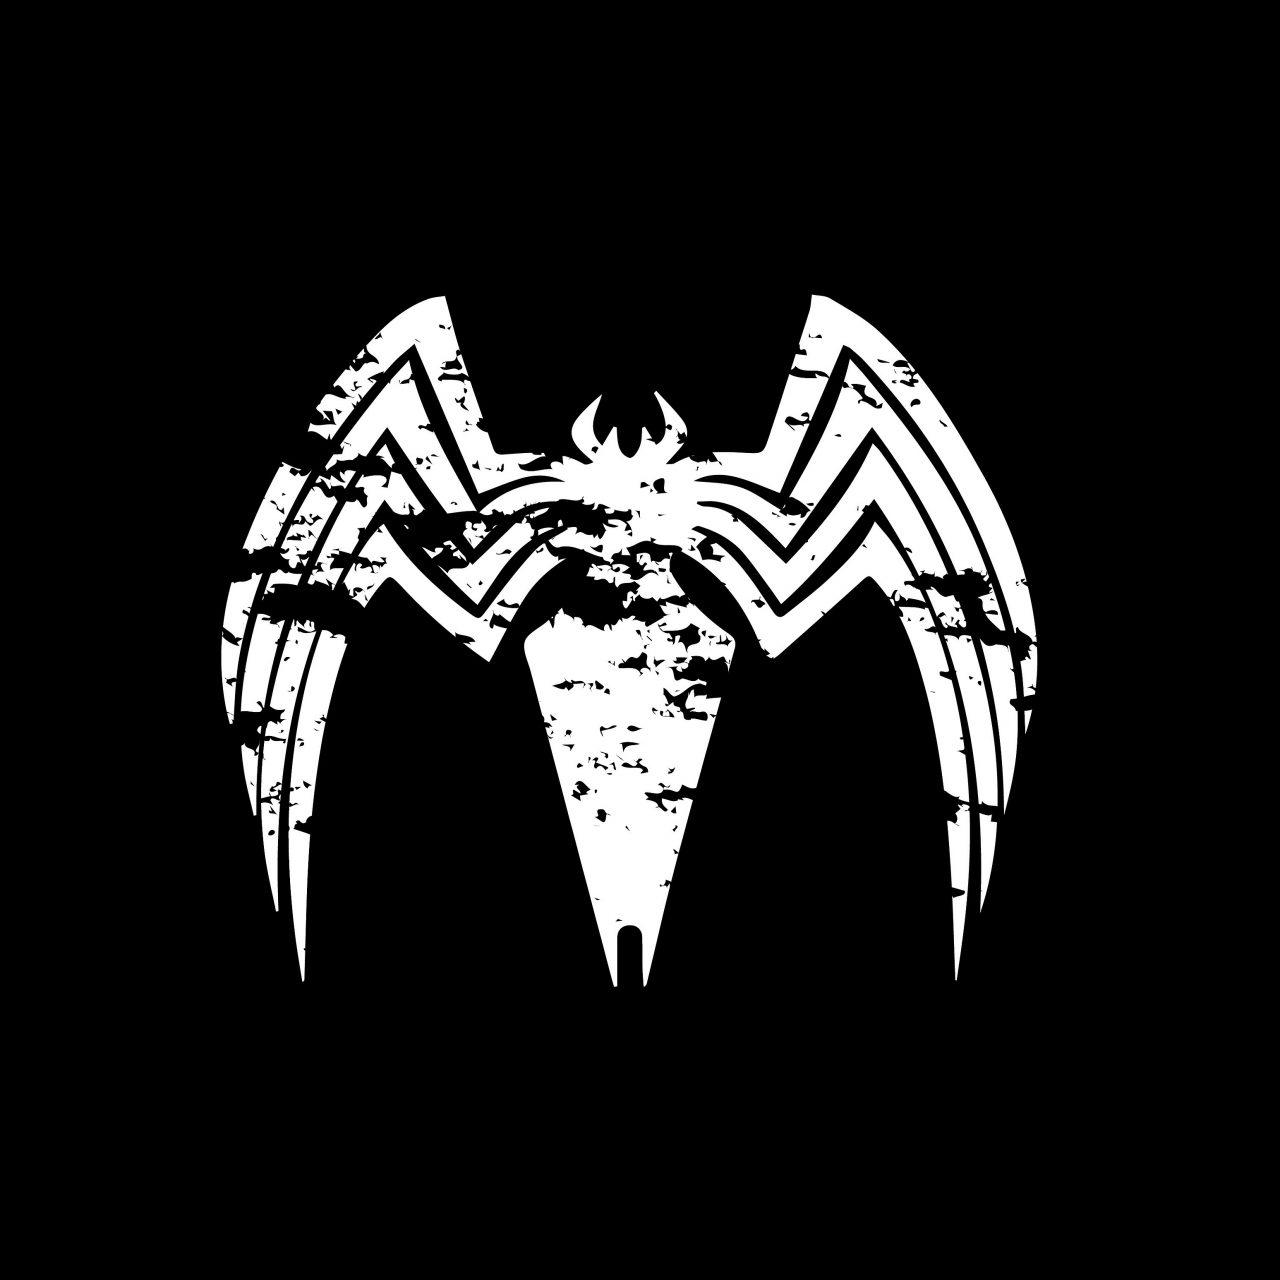 venom movie spider black poster 5k wallpaper best wallpapers Oblivion Movie Wallpaper 1080P apple